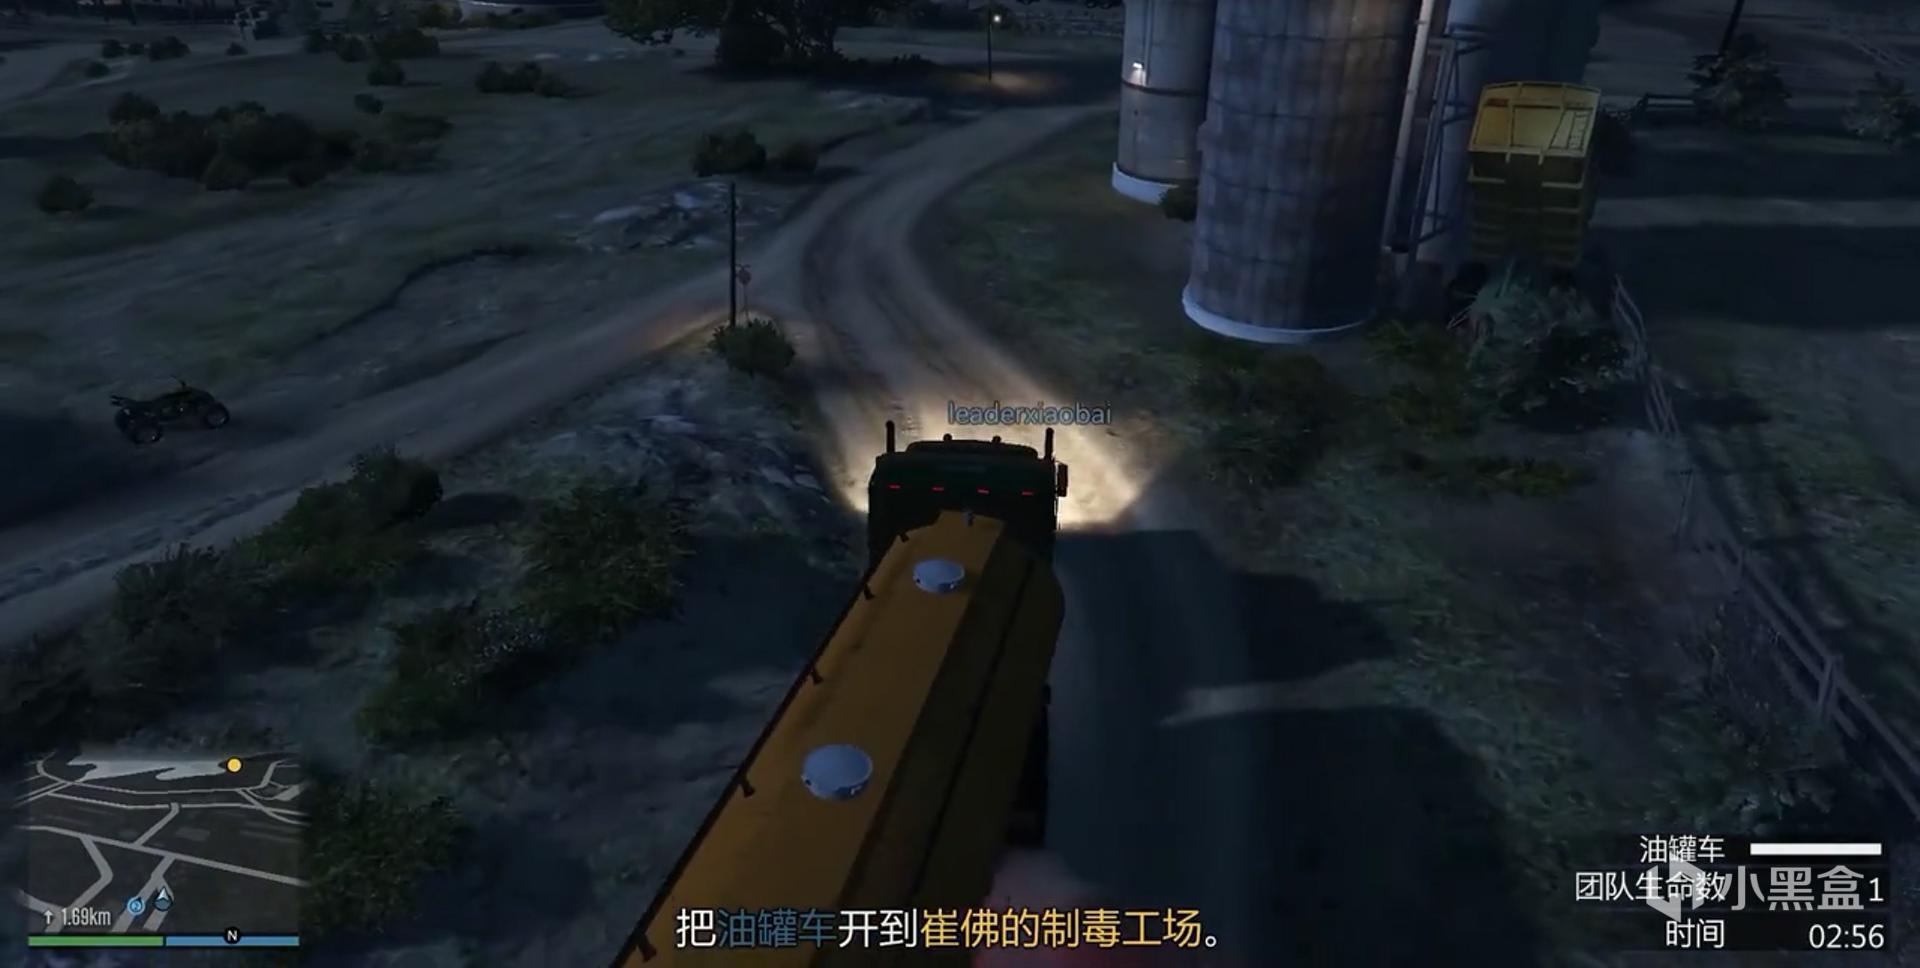 GTA5 首轮募资教程插图38